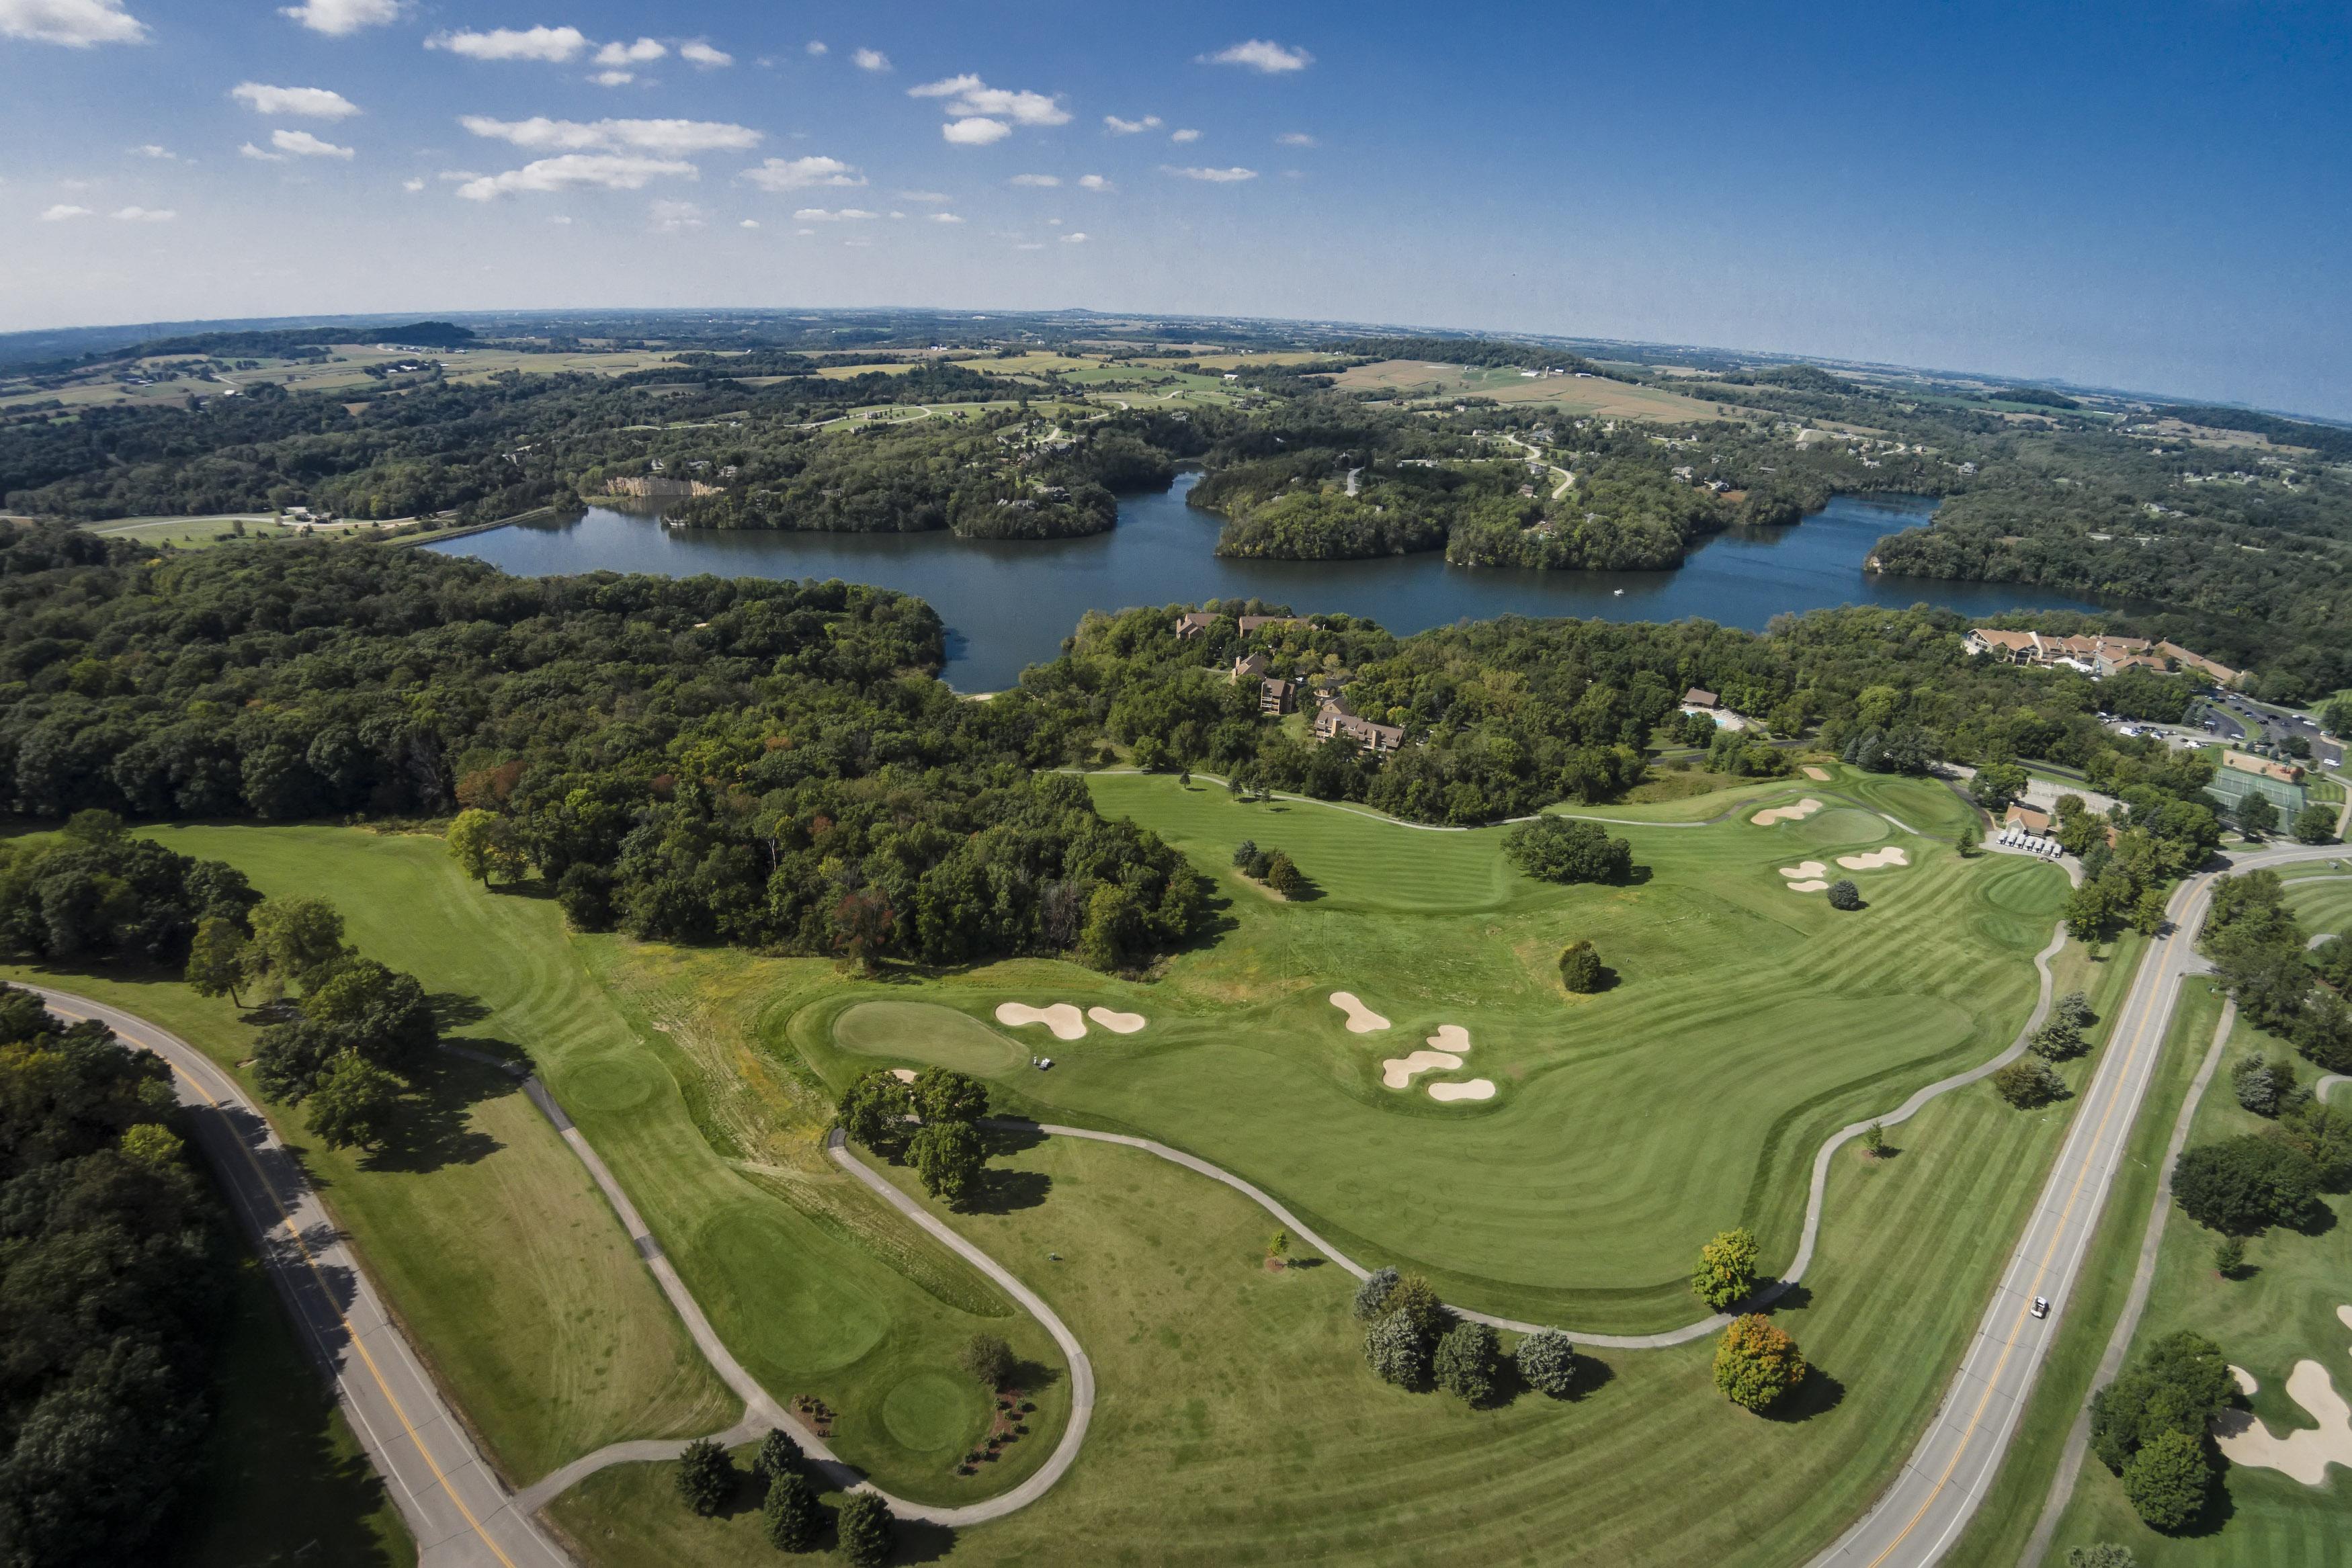 Eagle Ridge Resort and Spa: The original Illinois golf resort